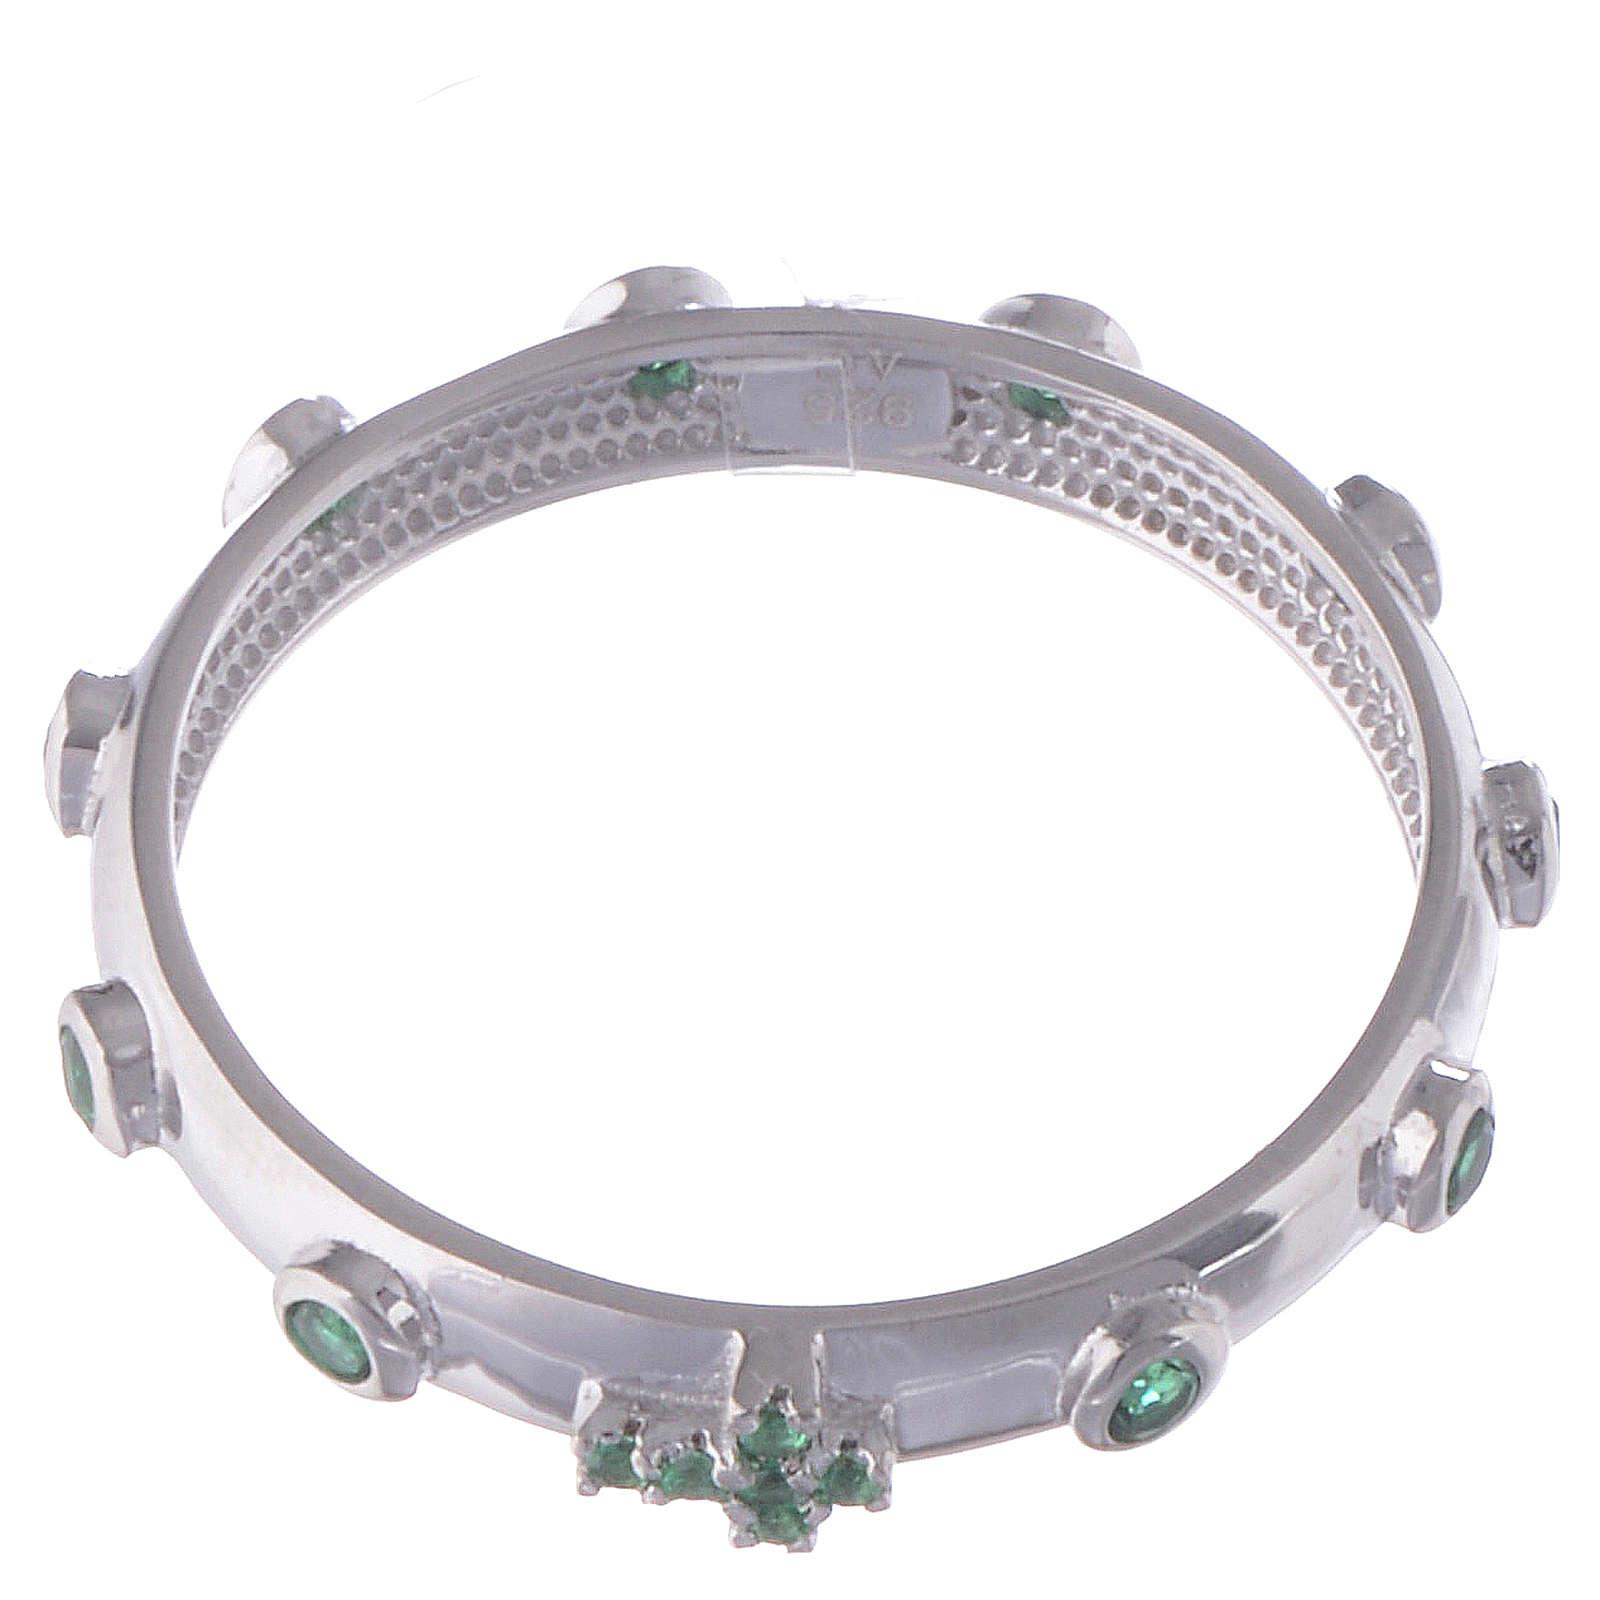 Anello rosario AMEN argento 925 zirconi verdi Rodio 3